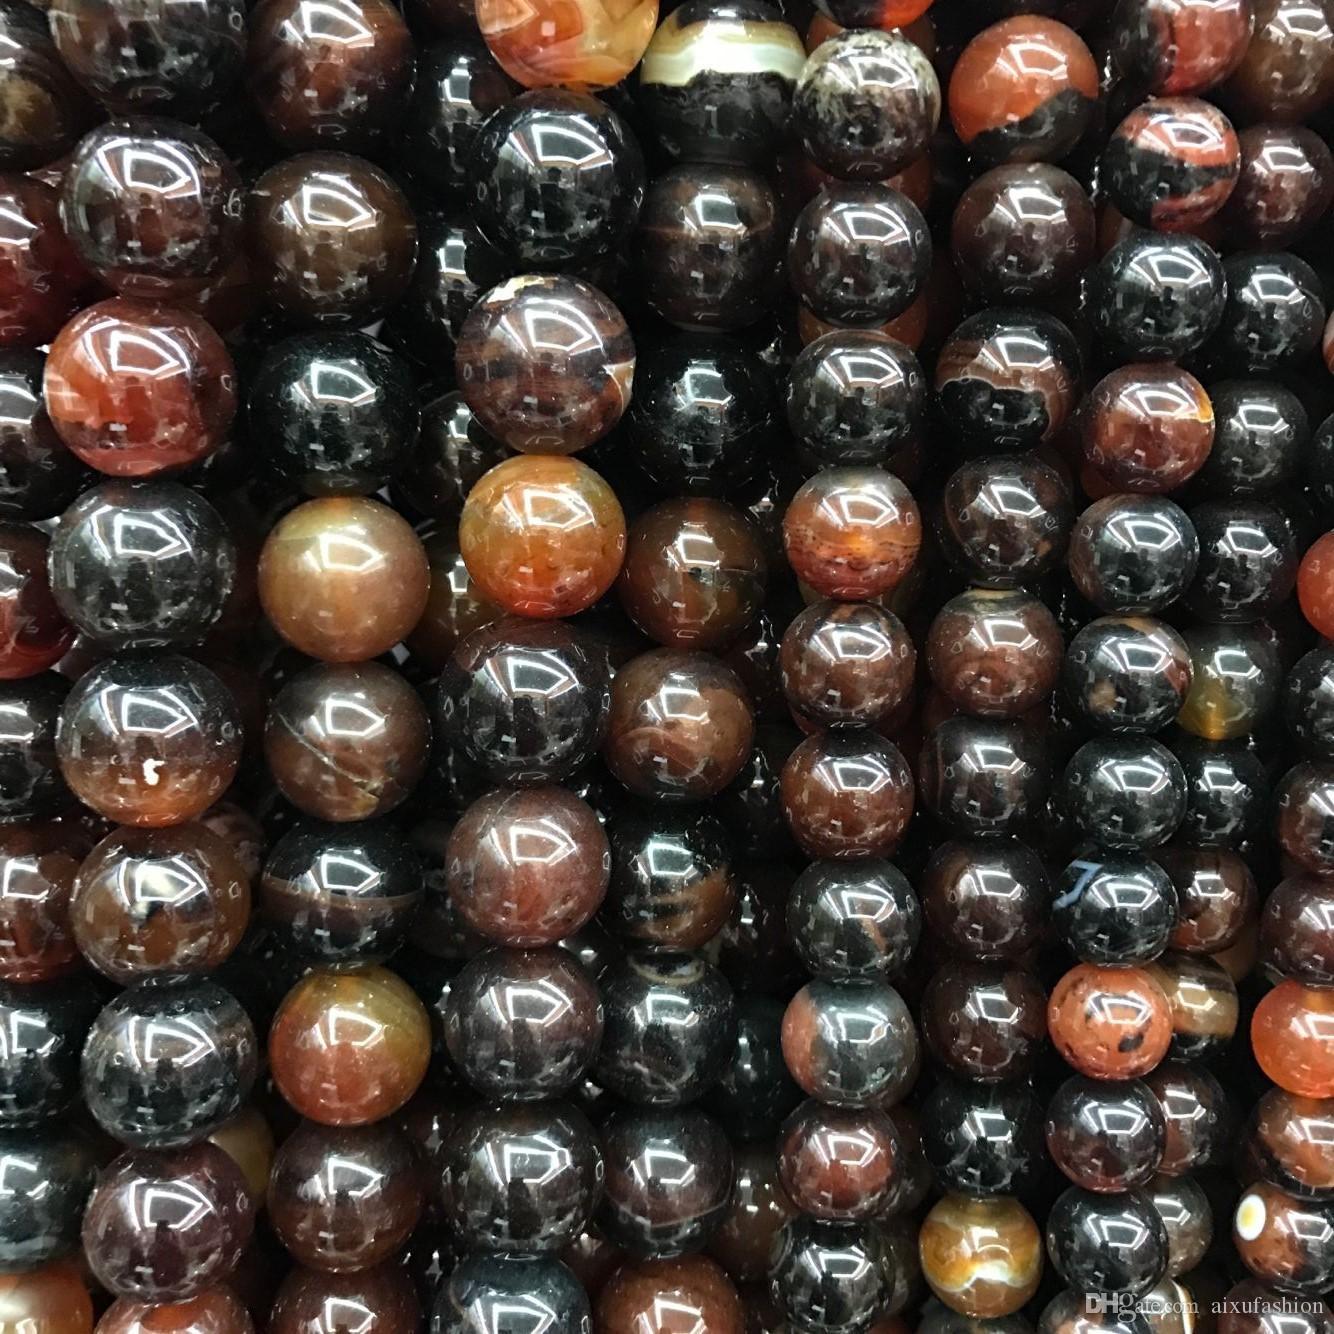 20mm Tea Dragon Gem Polish Beads Wholesale Round Natural Loose Stone Bead For Jewelry Making Stone Onyx Diy Bracelet Strand 40cm